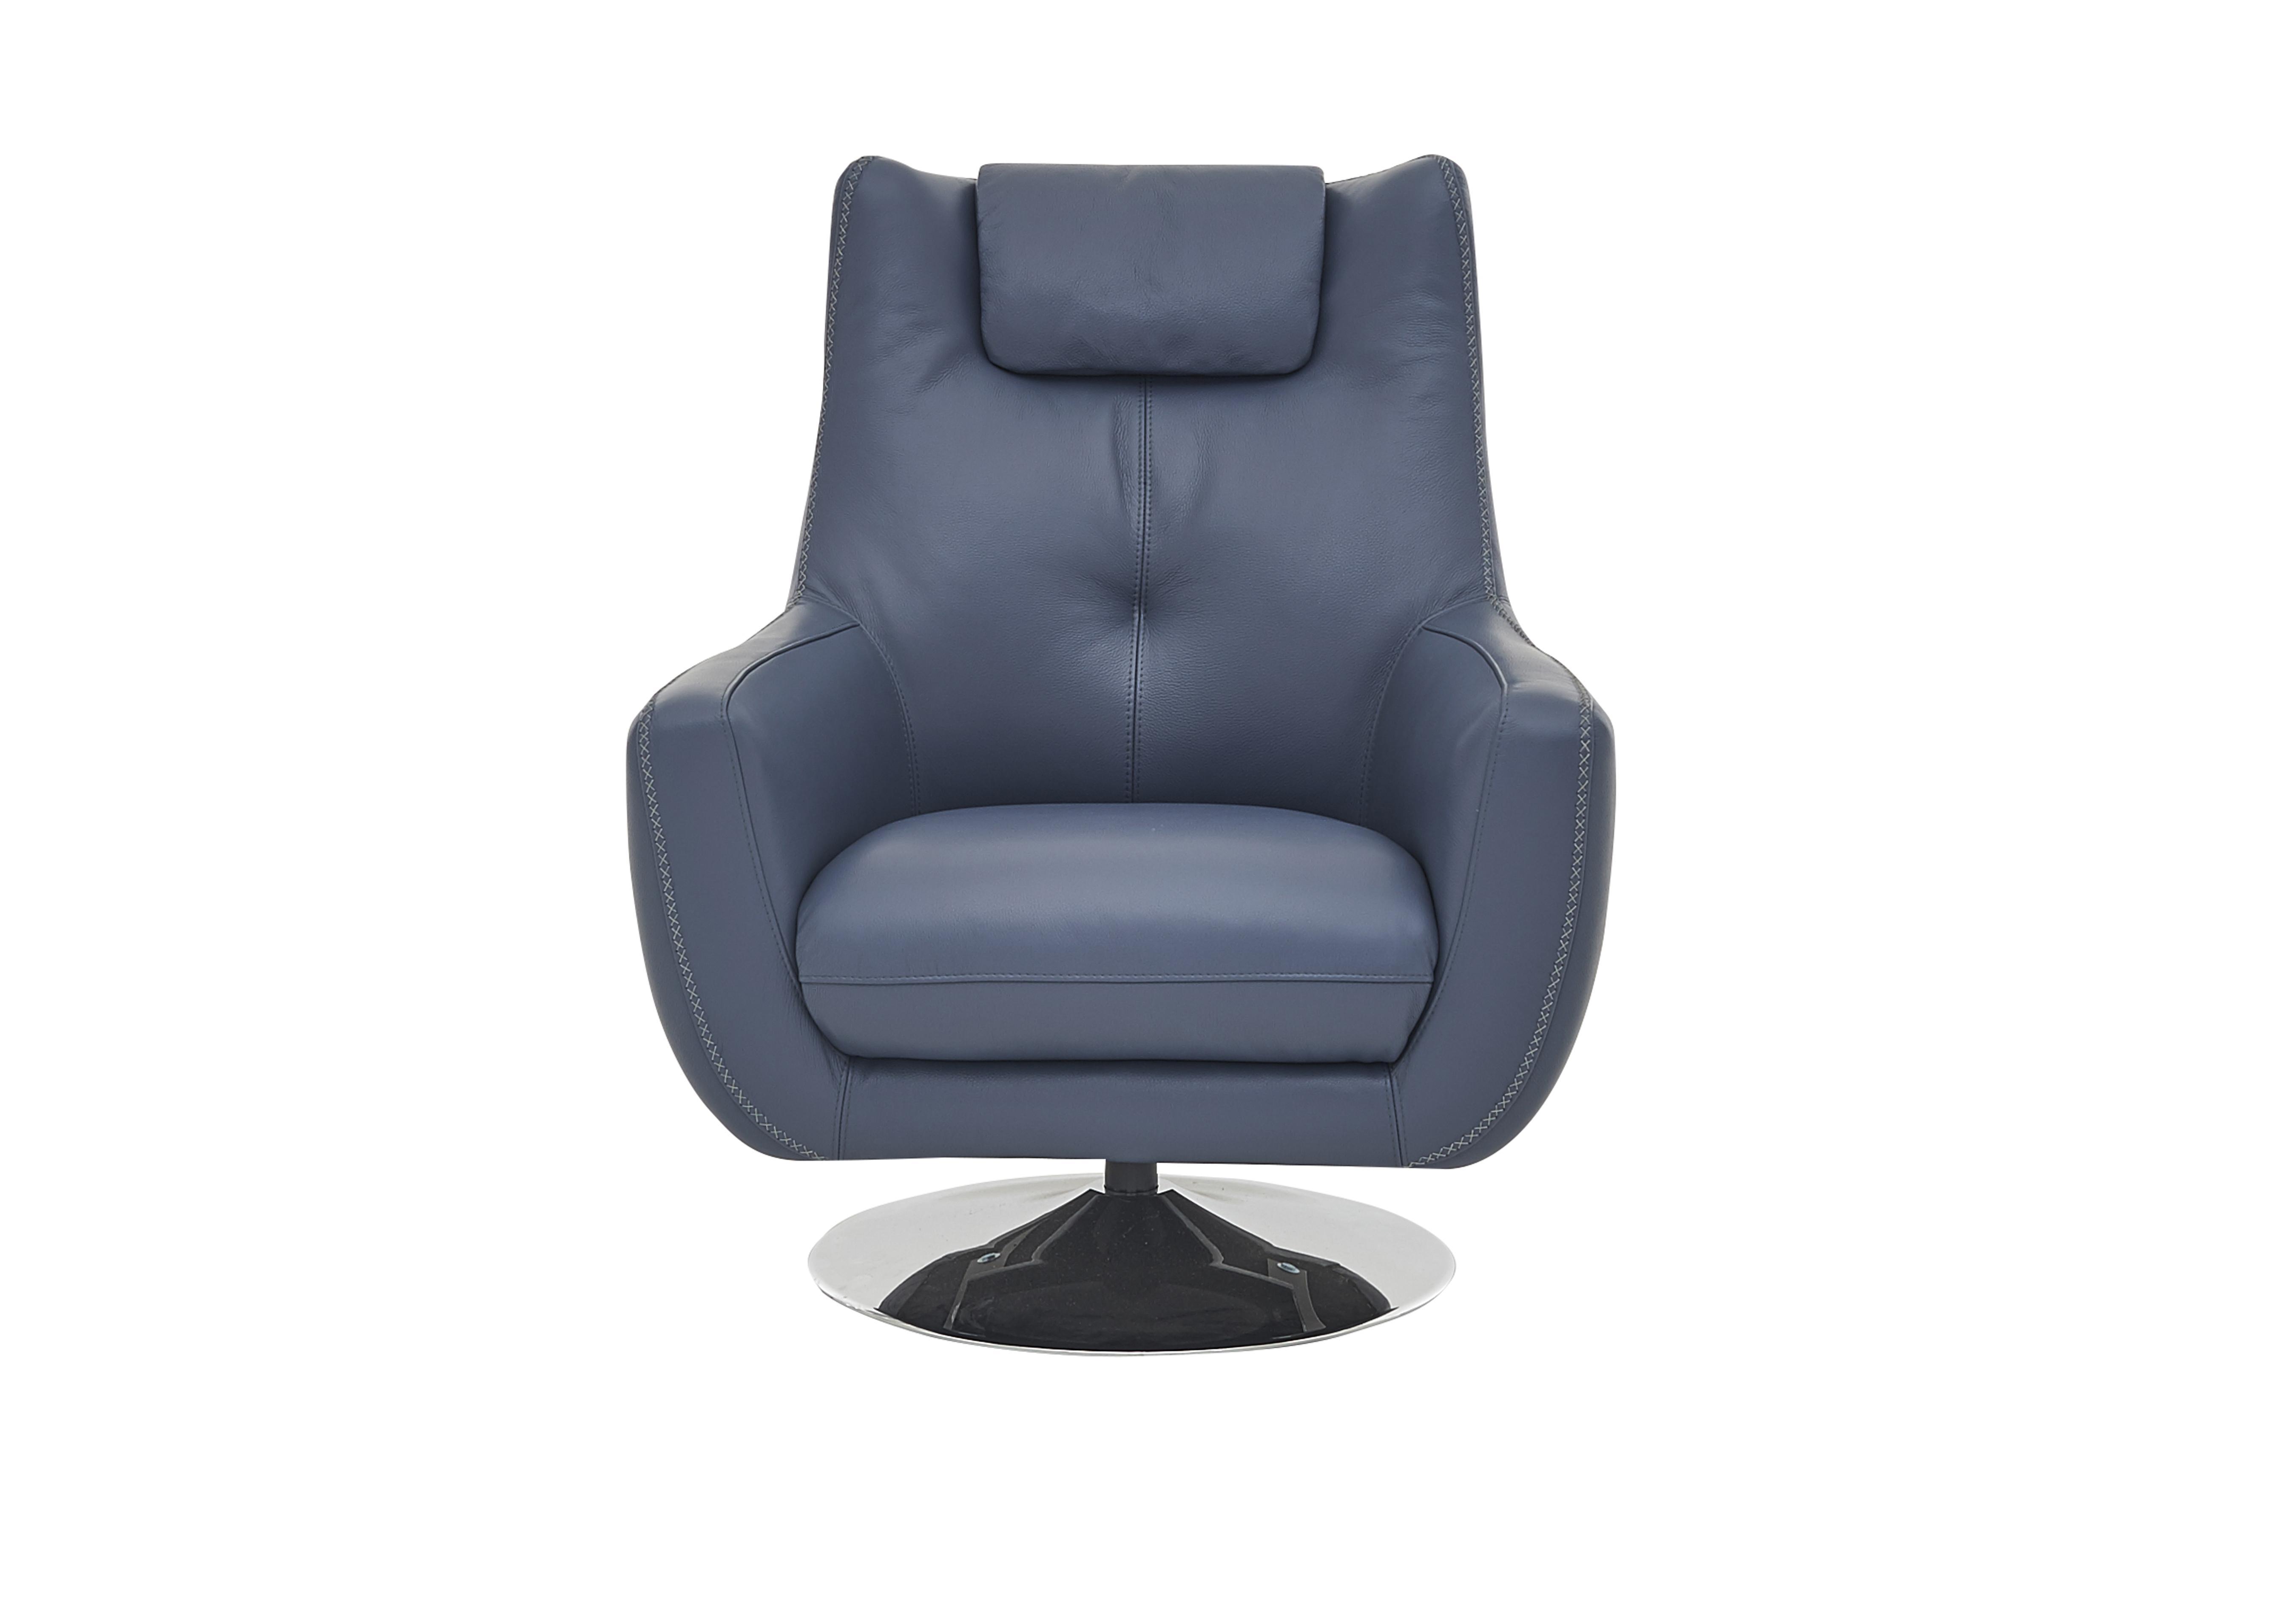 Sanza Leather Swivel Armchair World of Leather Furniture Village